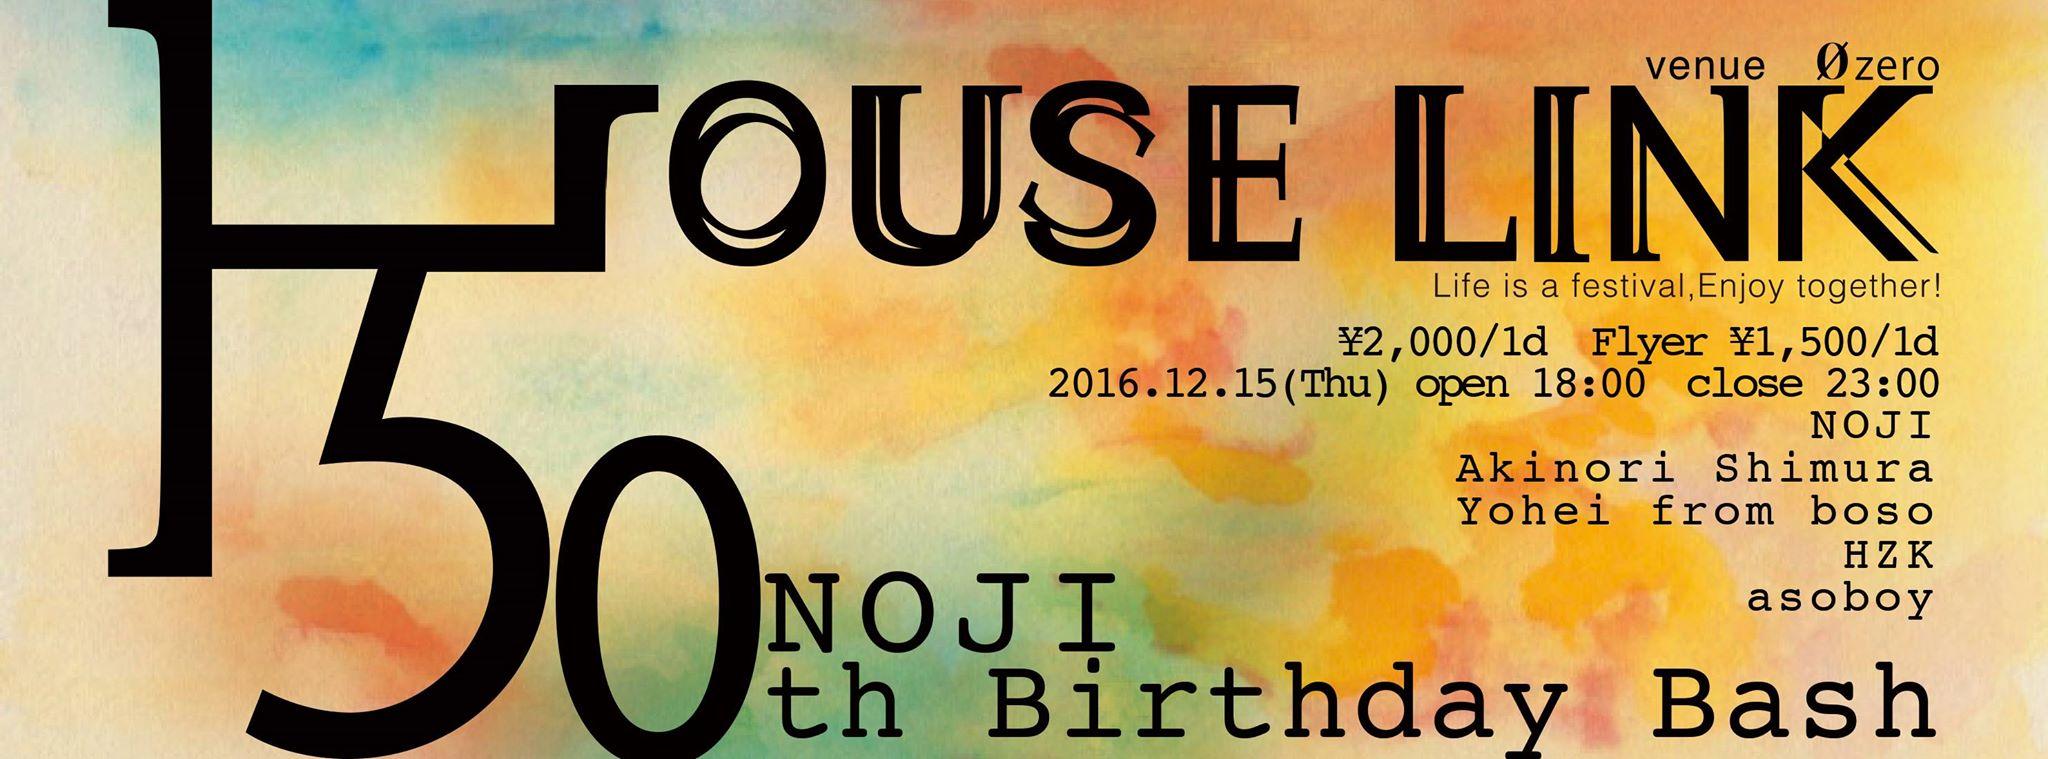 HOUSE LINK -DJ NOJI 50th Birthday Bash-